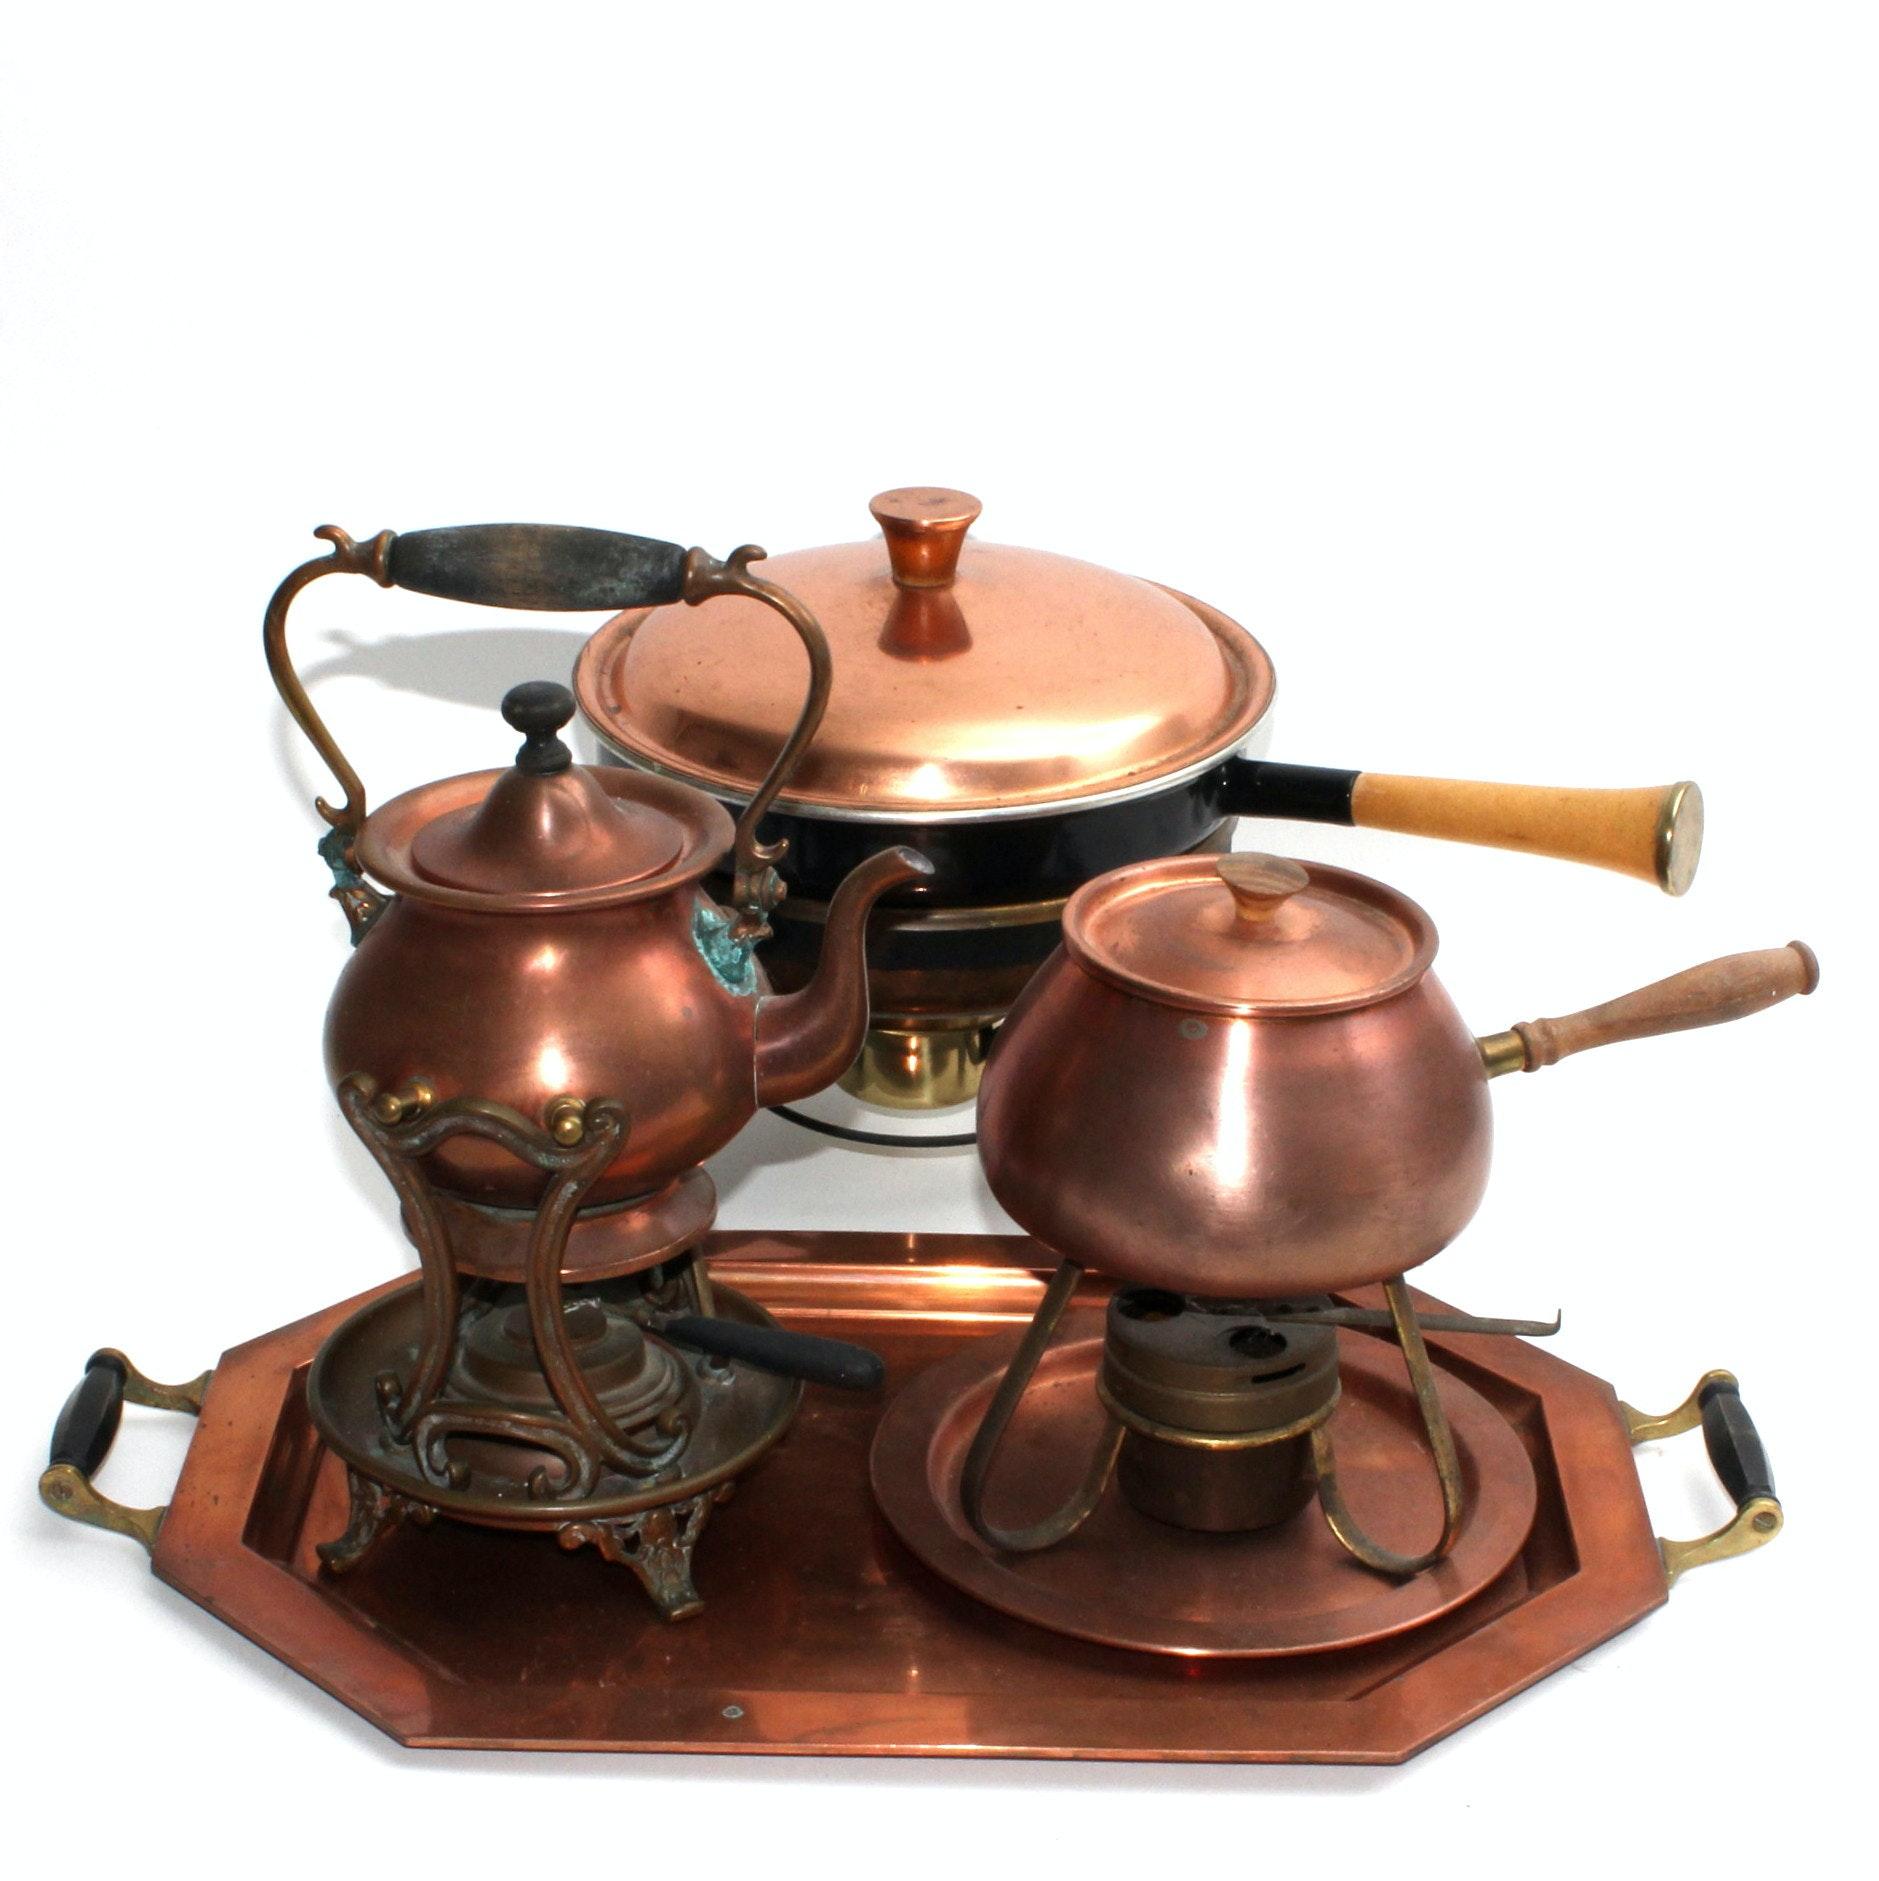 Antique and Vintage Copperware